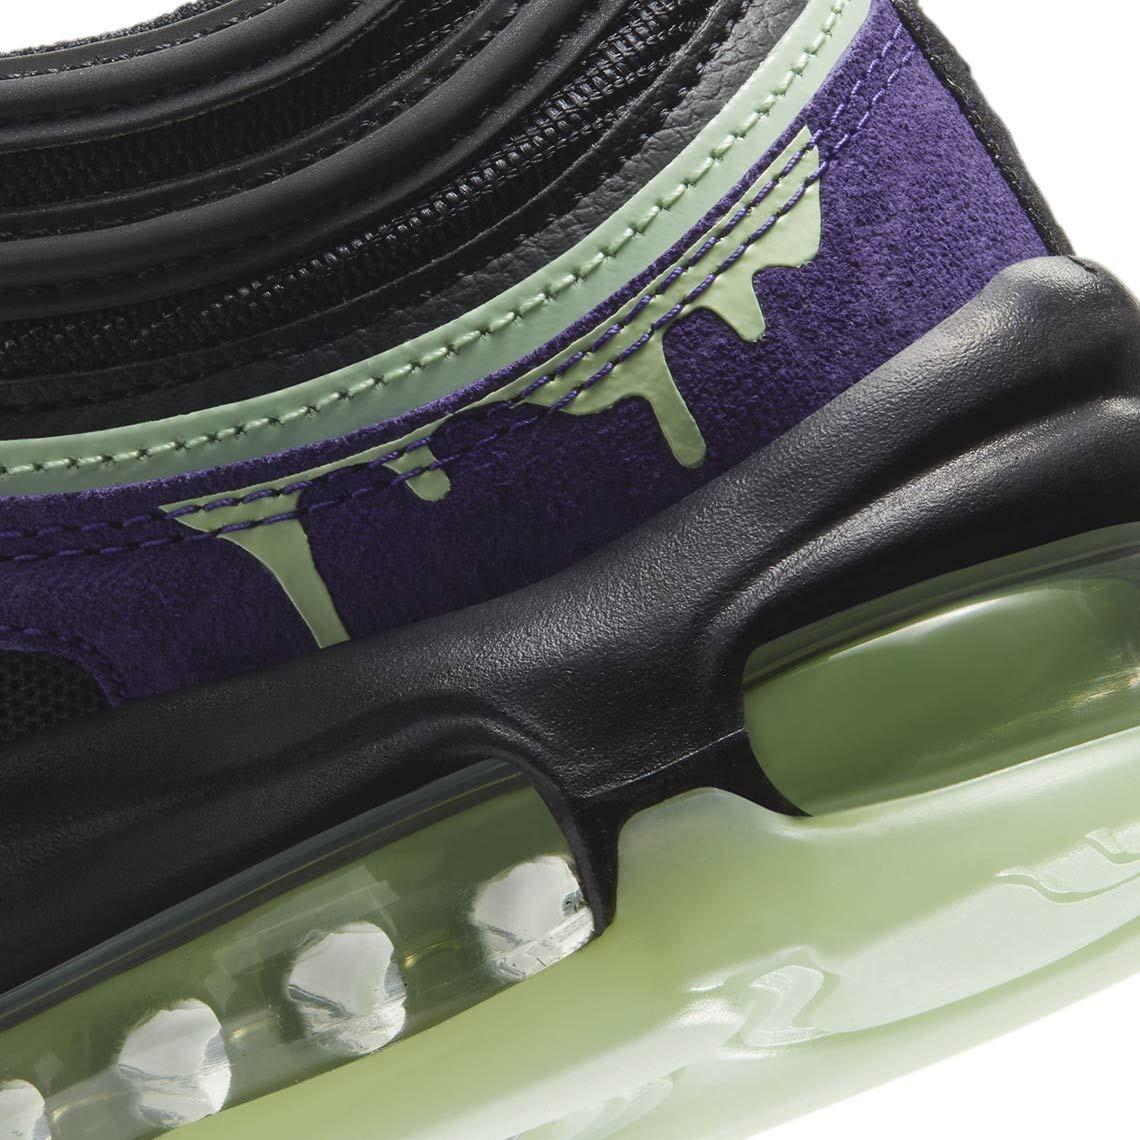 Nike Air Max 97 Slime